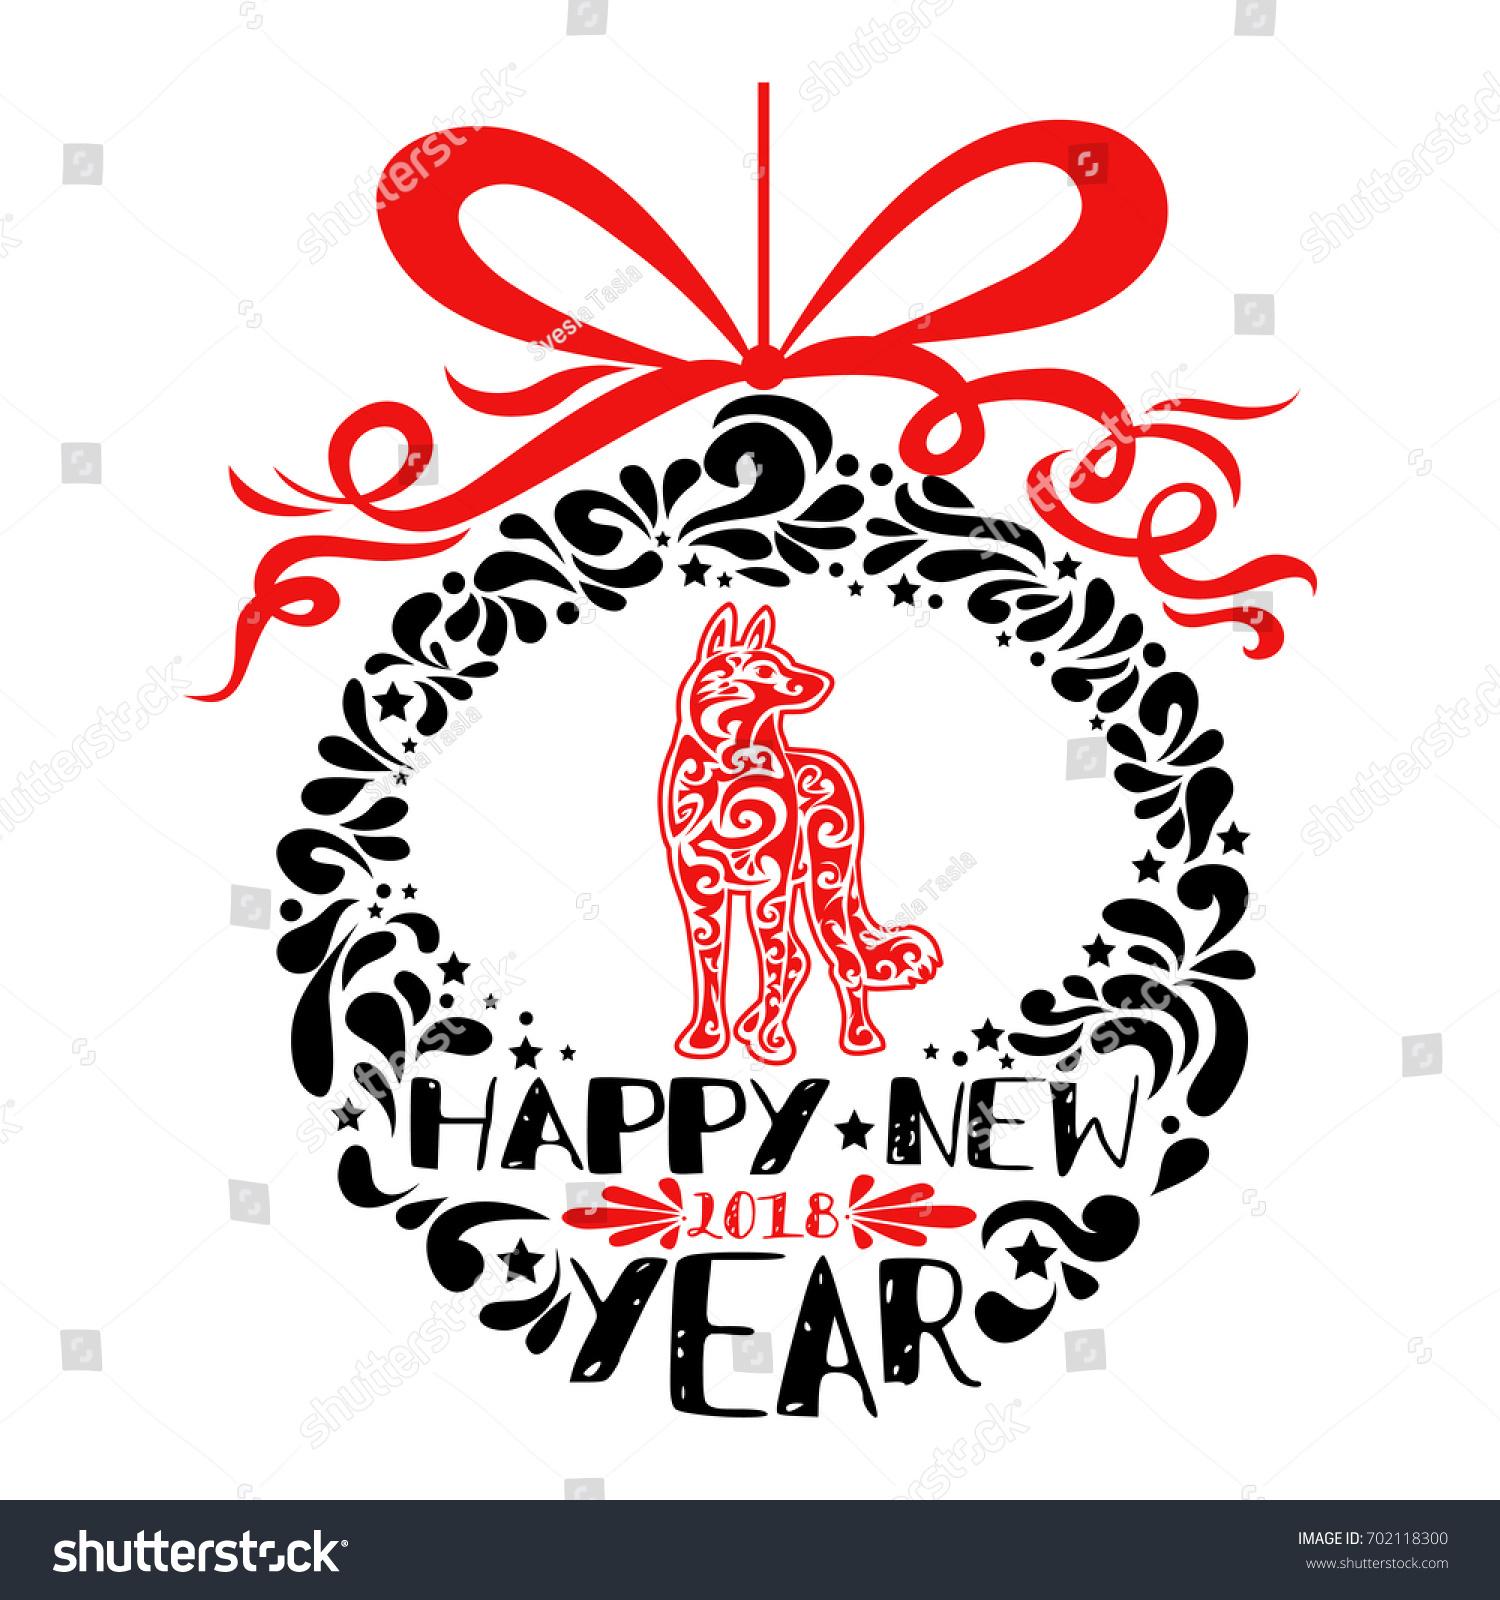 Christmas ball dog silhouette zodiac symbol stock vector 702118300 christmas ball with dog silhouette zodiac symbol happy new year 2018 text christmas design buycottarizona Images